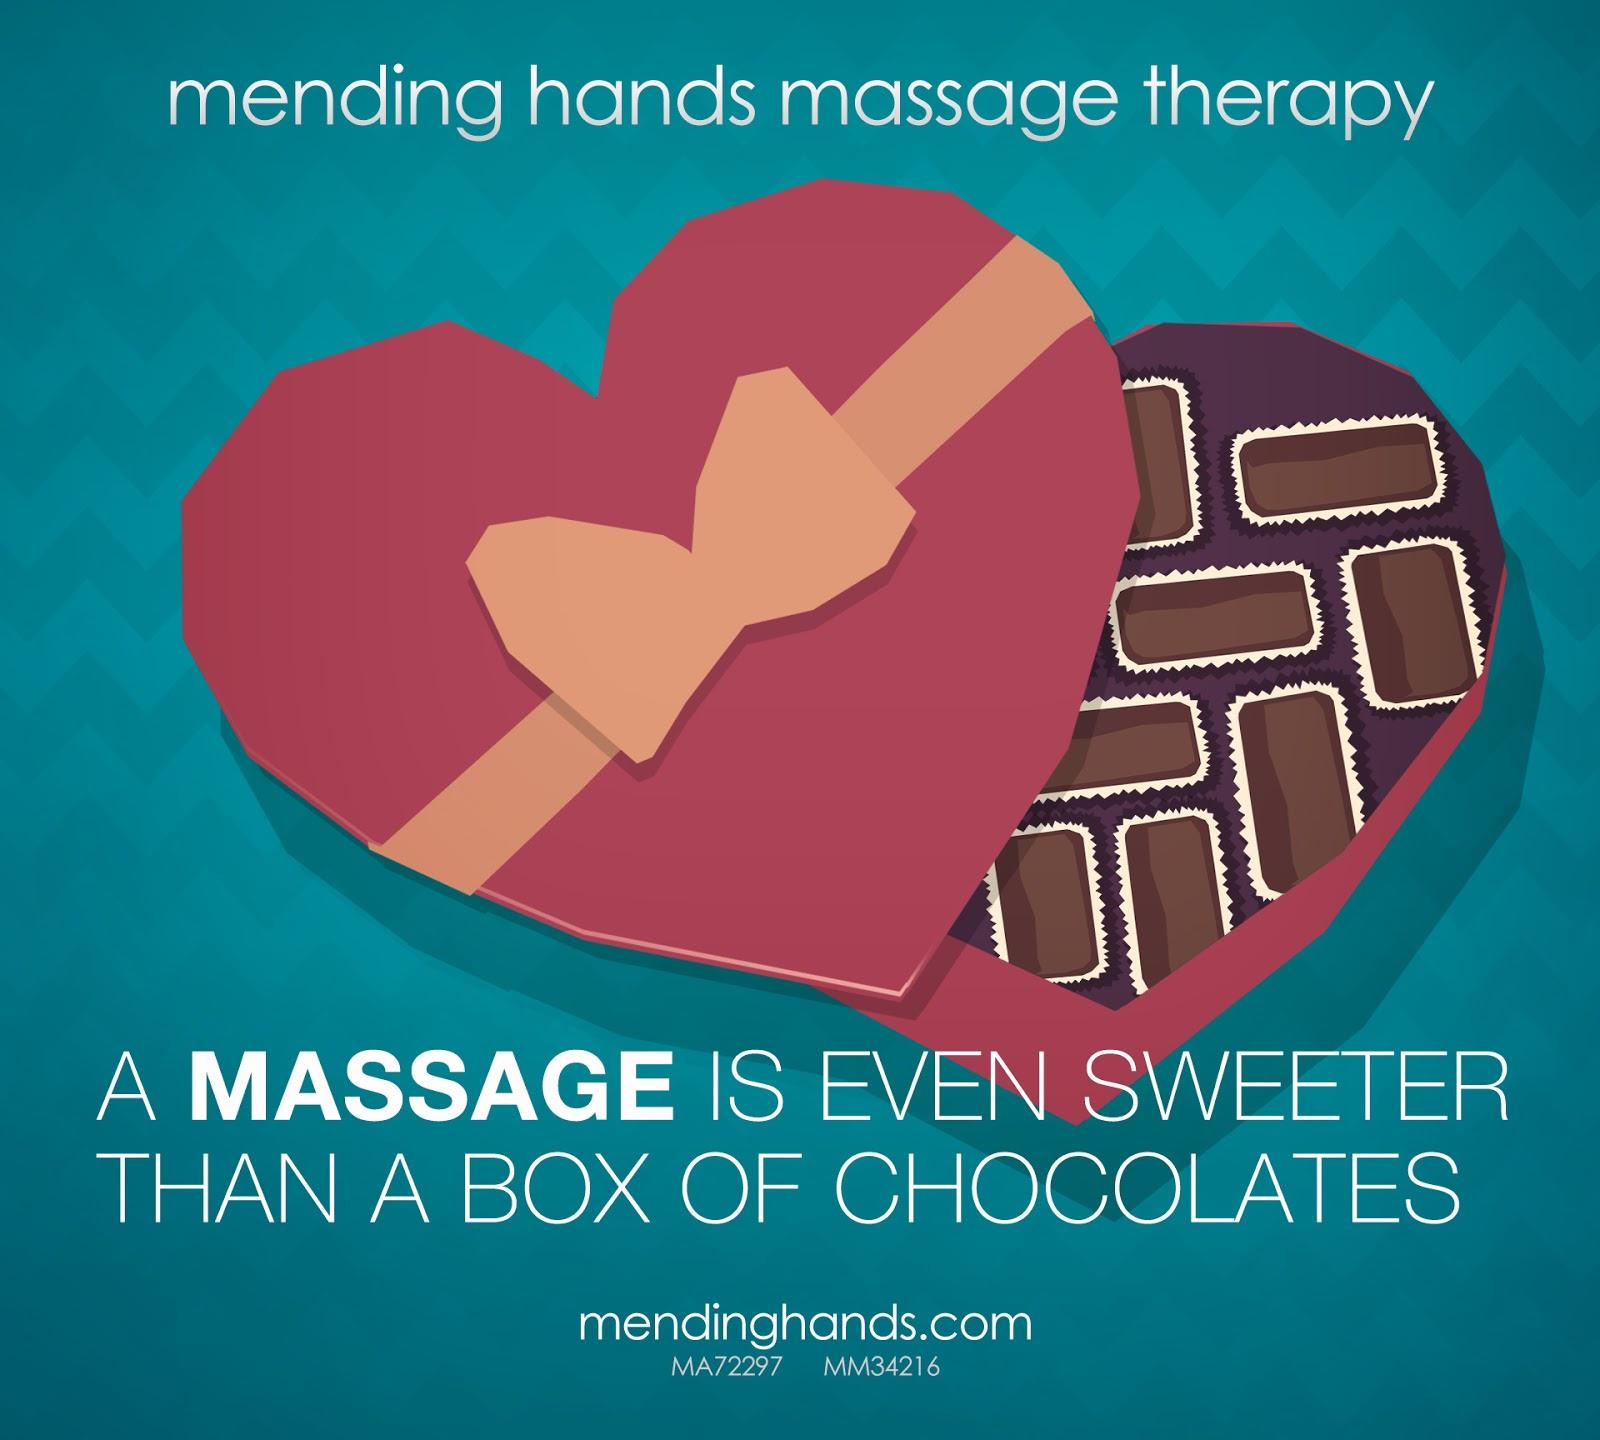 Sarasota Massage Mending Hands Melissa Finley Srq 34239